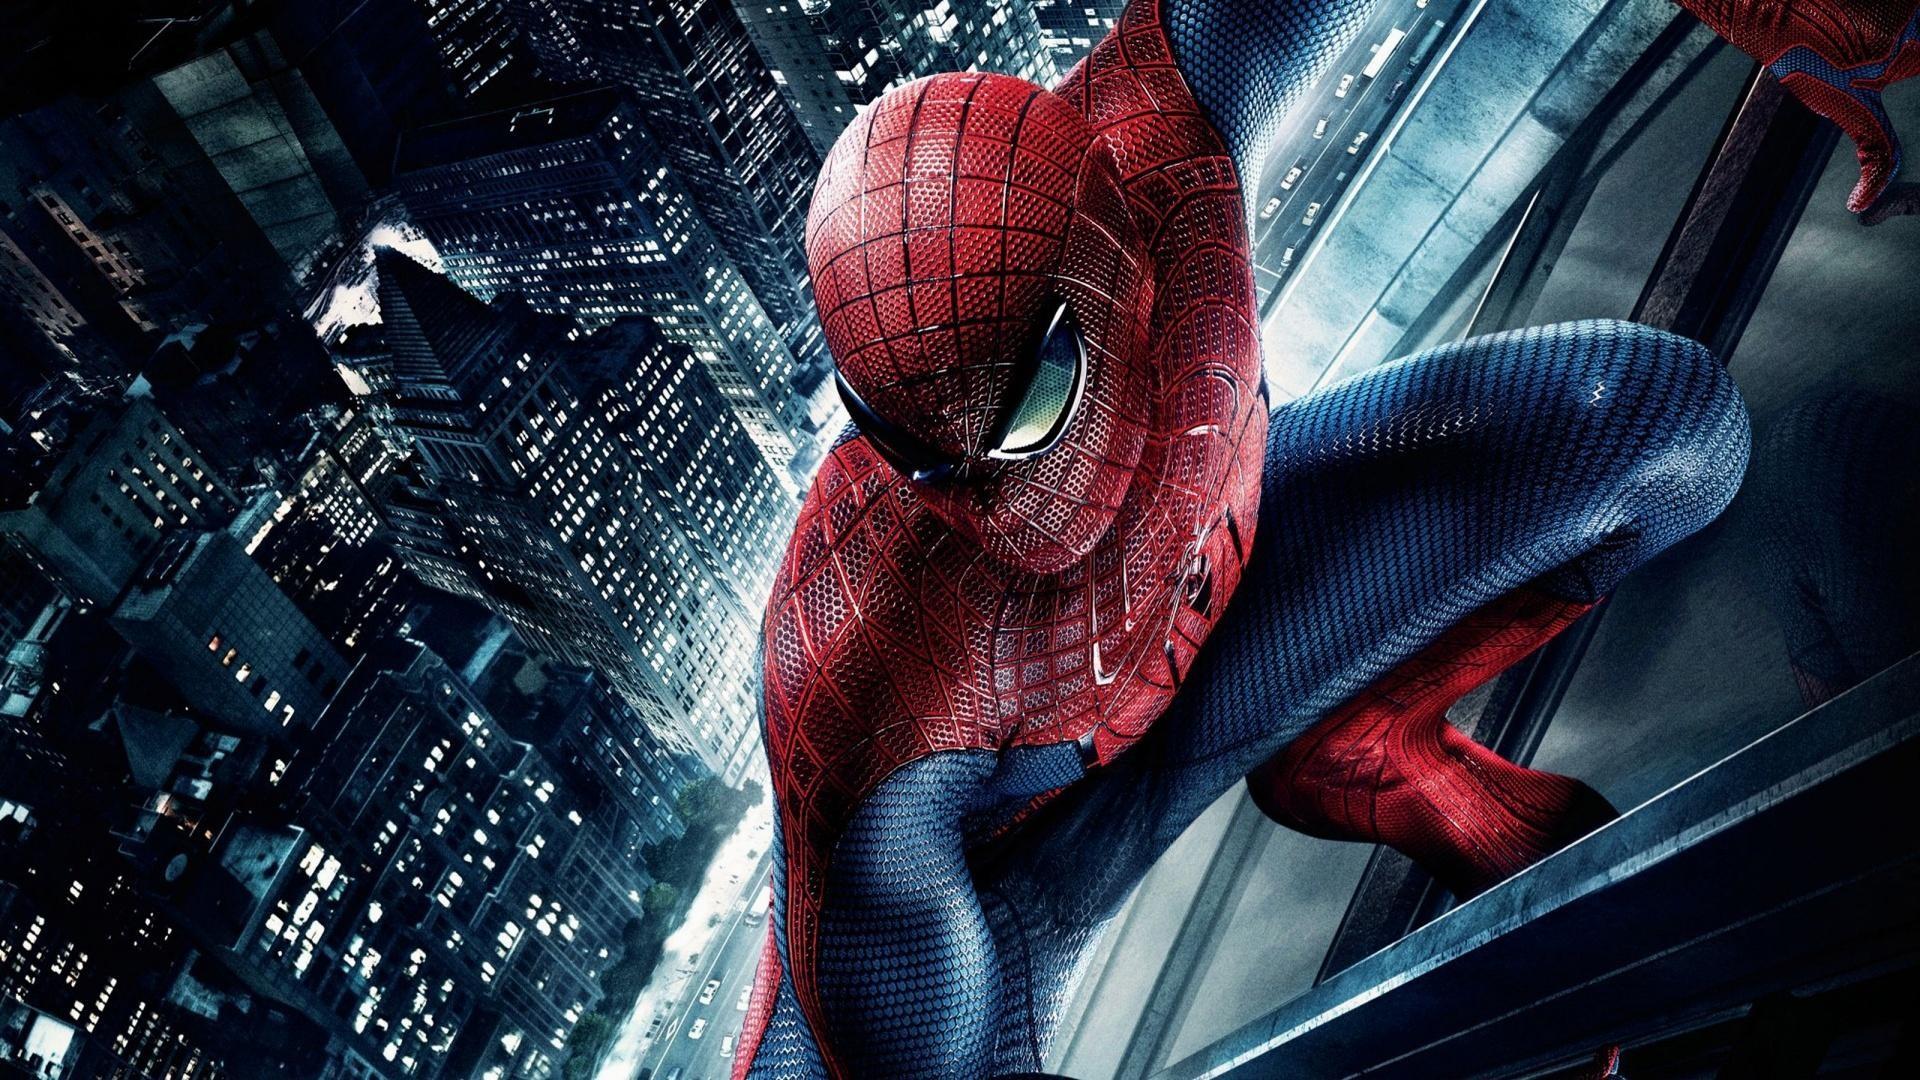 1920x1080 hd pics photos best stunning amazing spiderman nice hollywood movie hd quality desktop background wallpaper